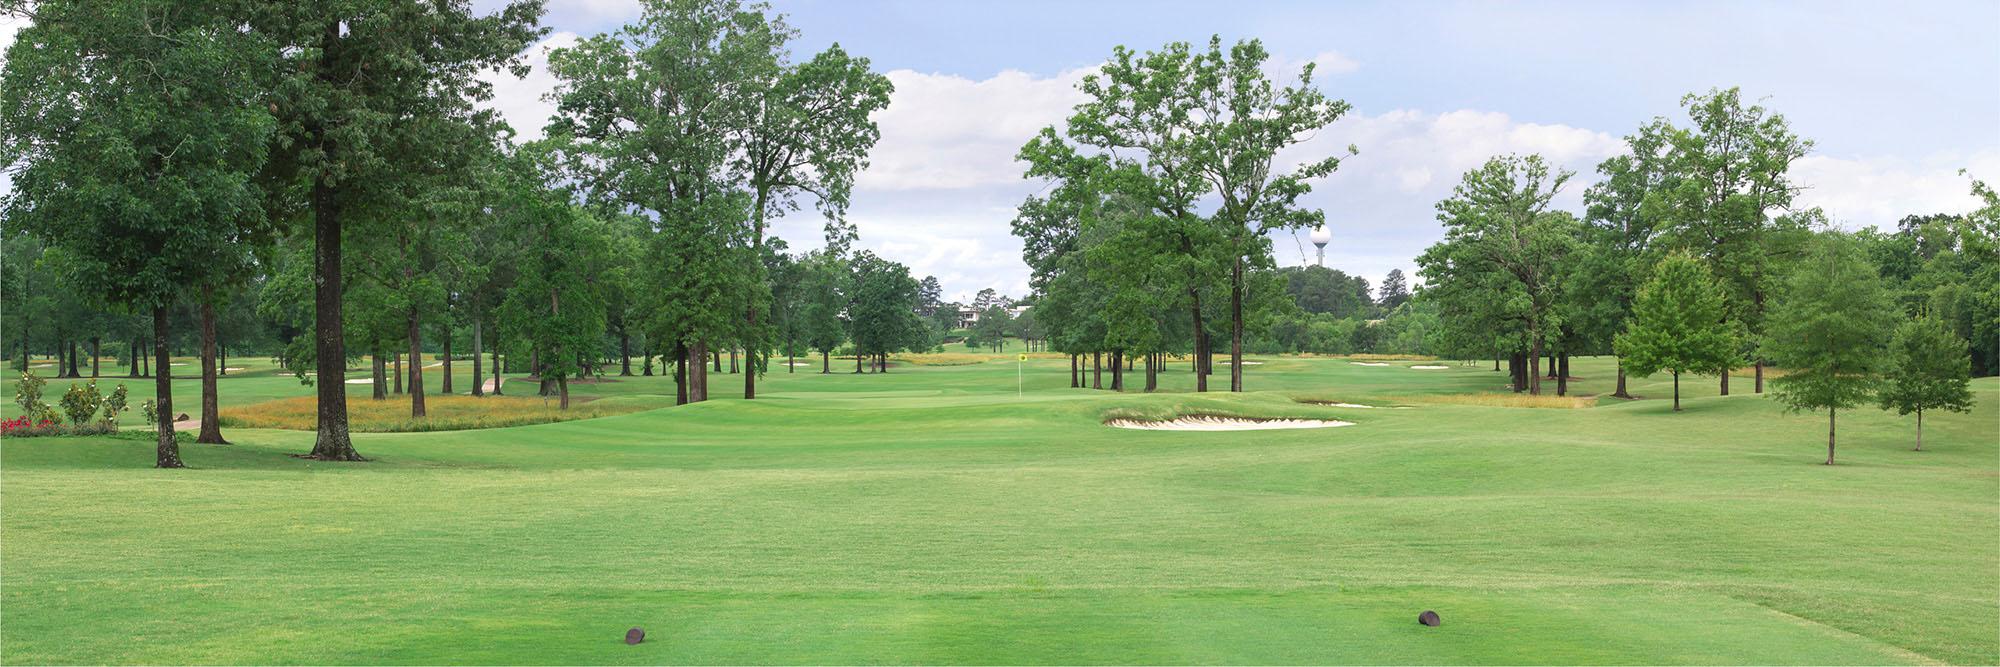 Golf Course Image - Country Club of Jackson No. 4